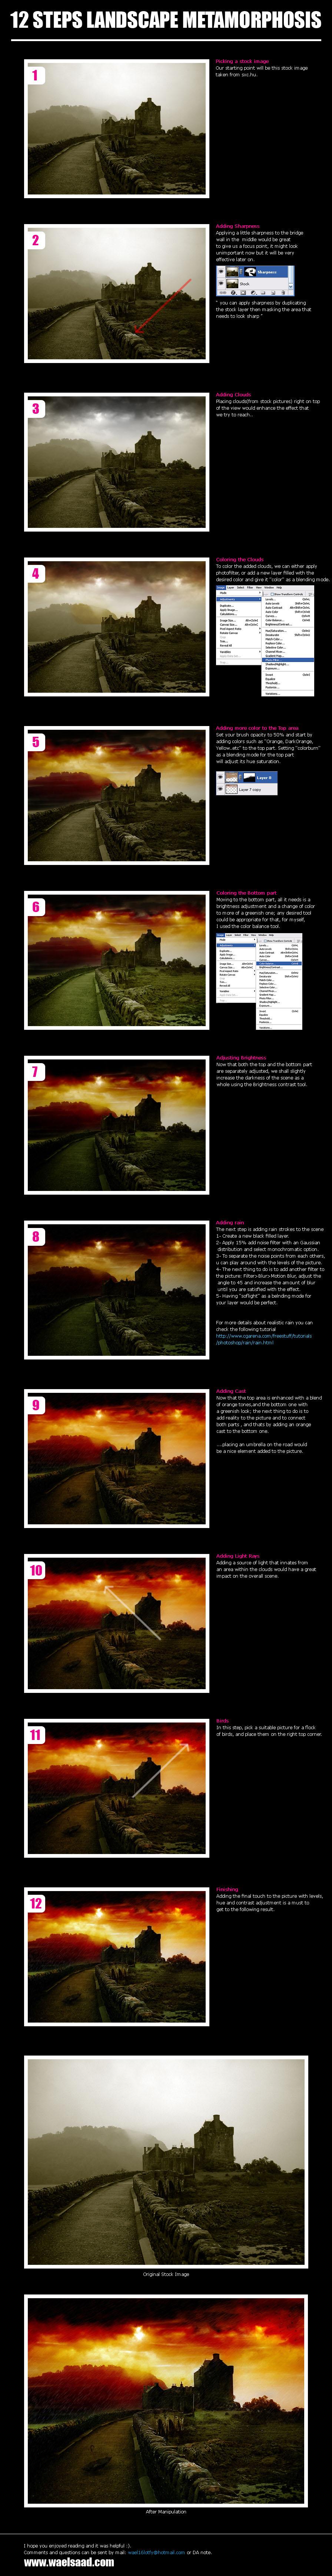 12 steps landscape metamorphos by dpainter